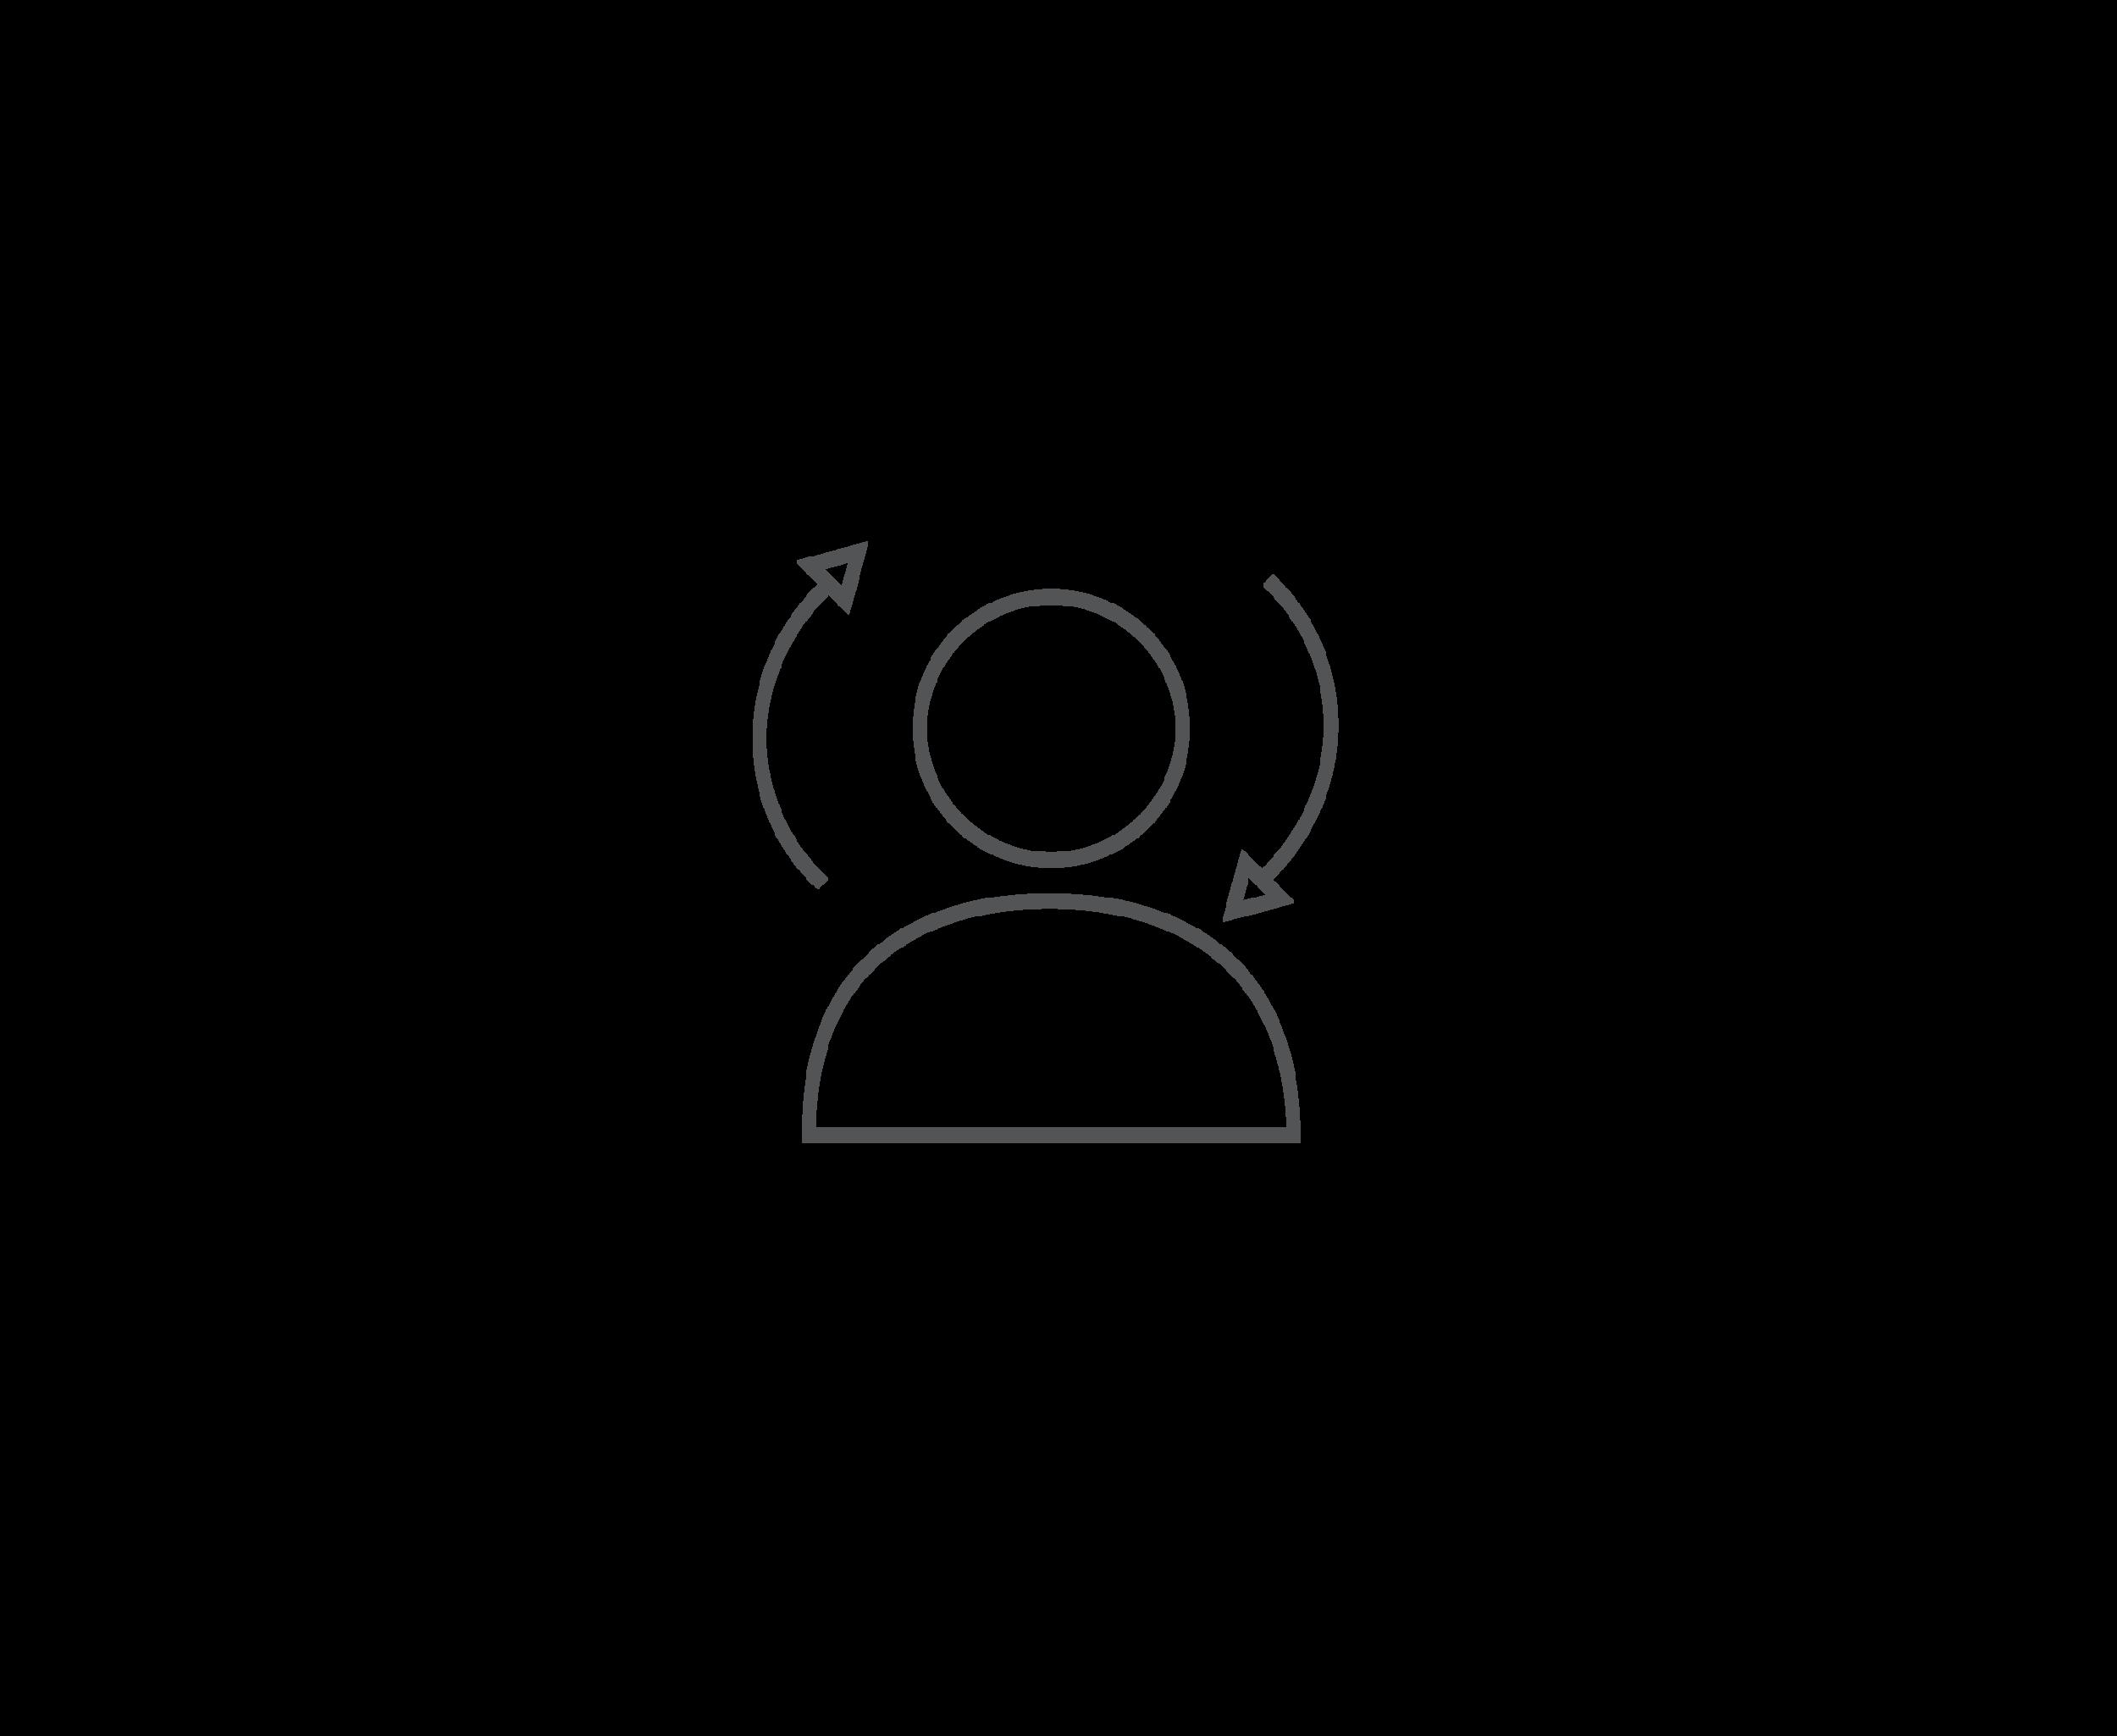 input illustrator2-19.png